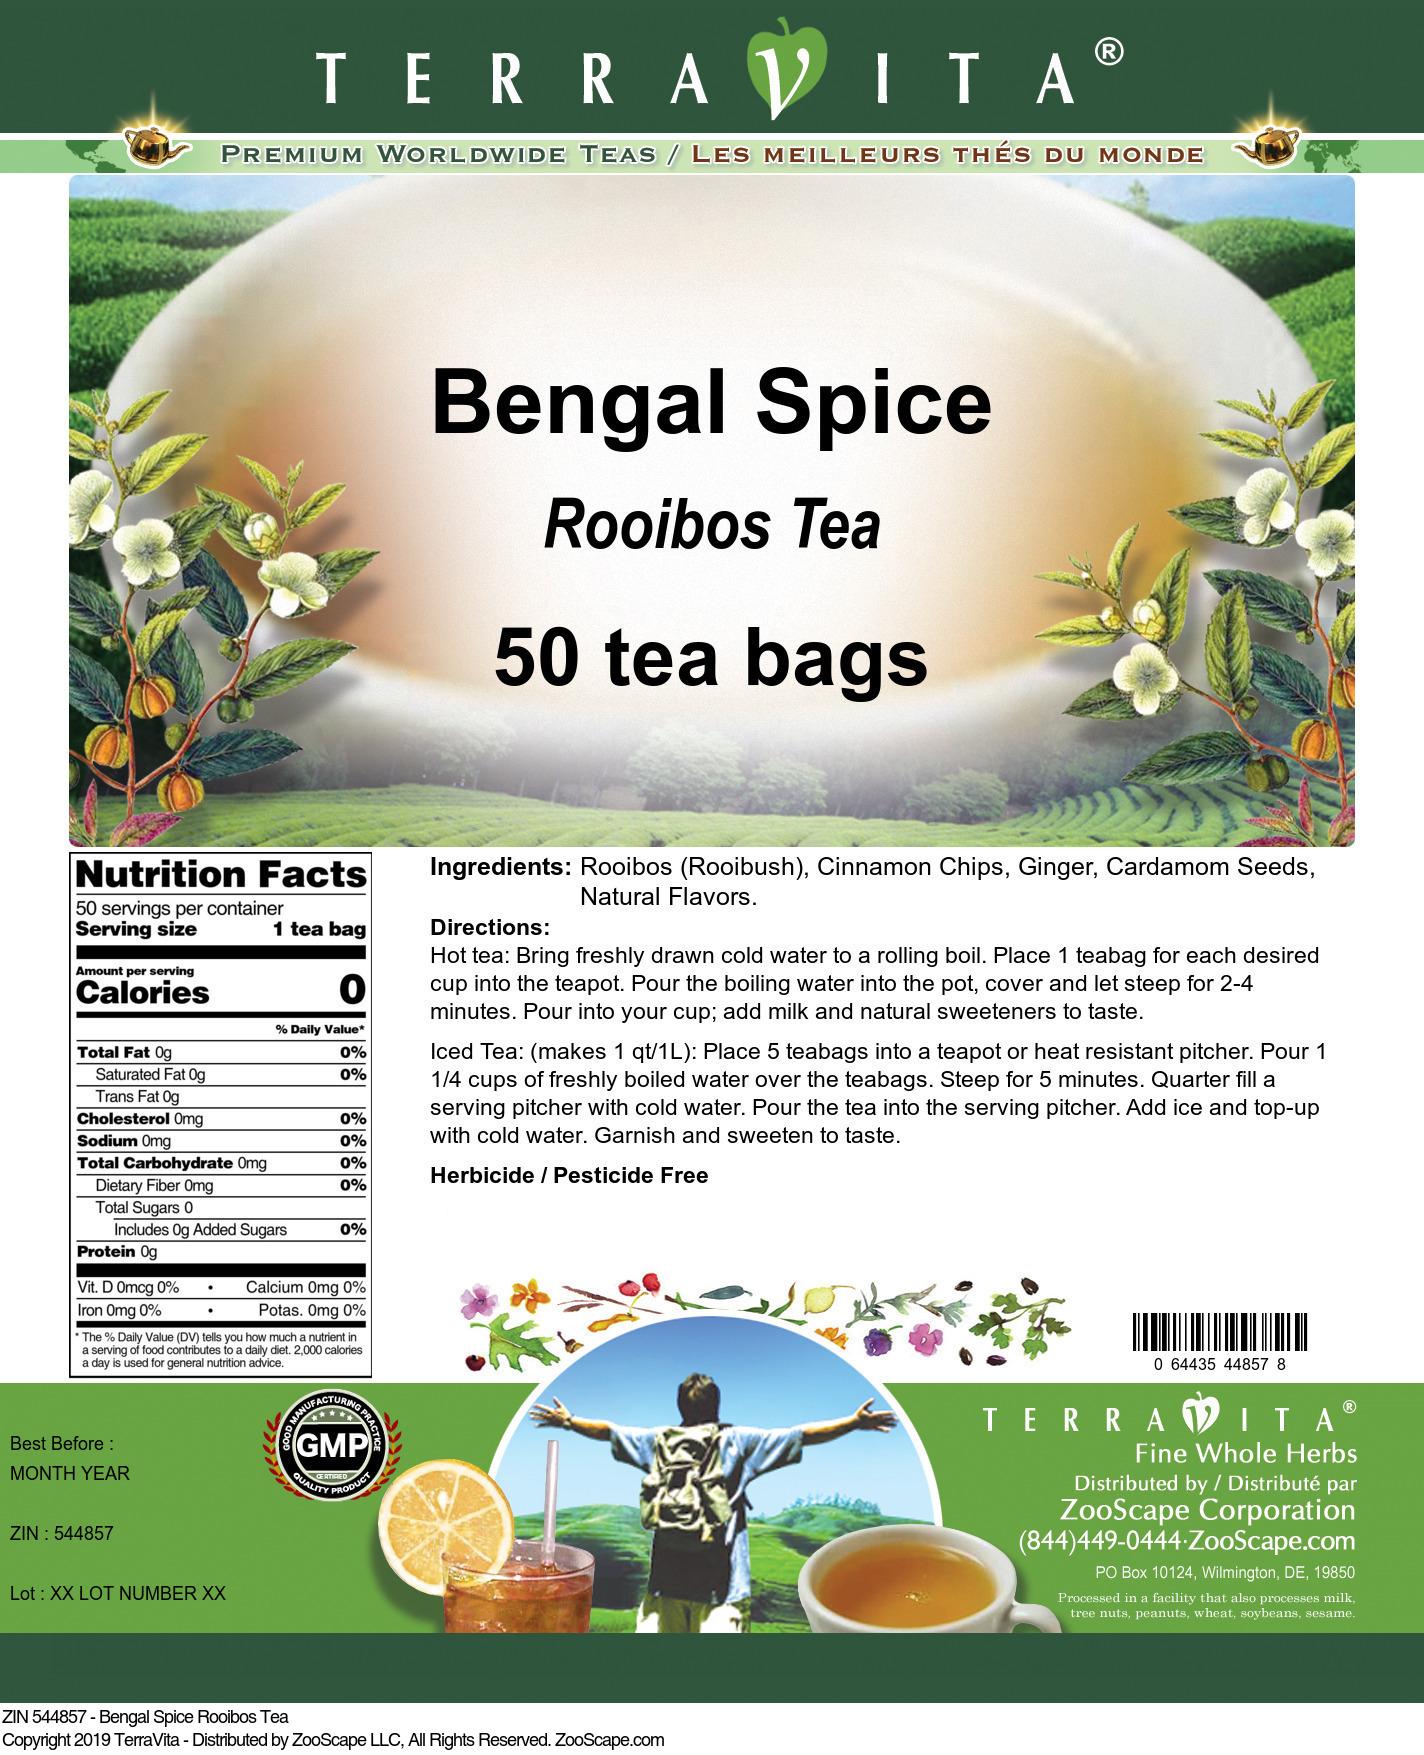 Bengal Spice Rooibos Tea